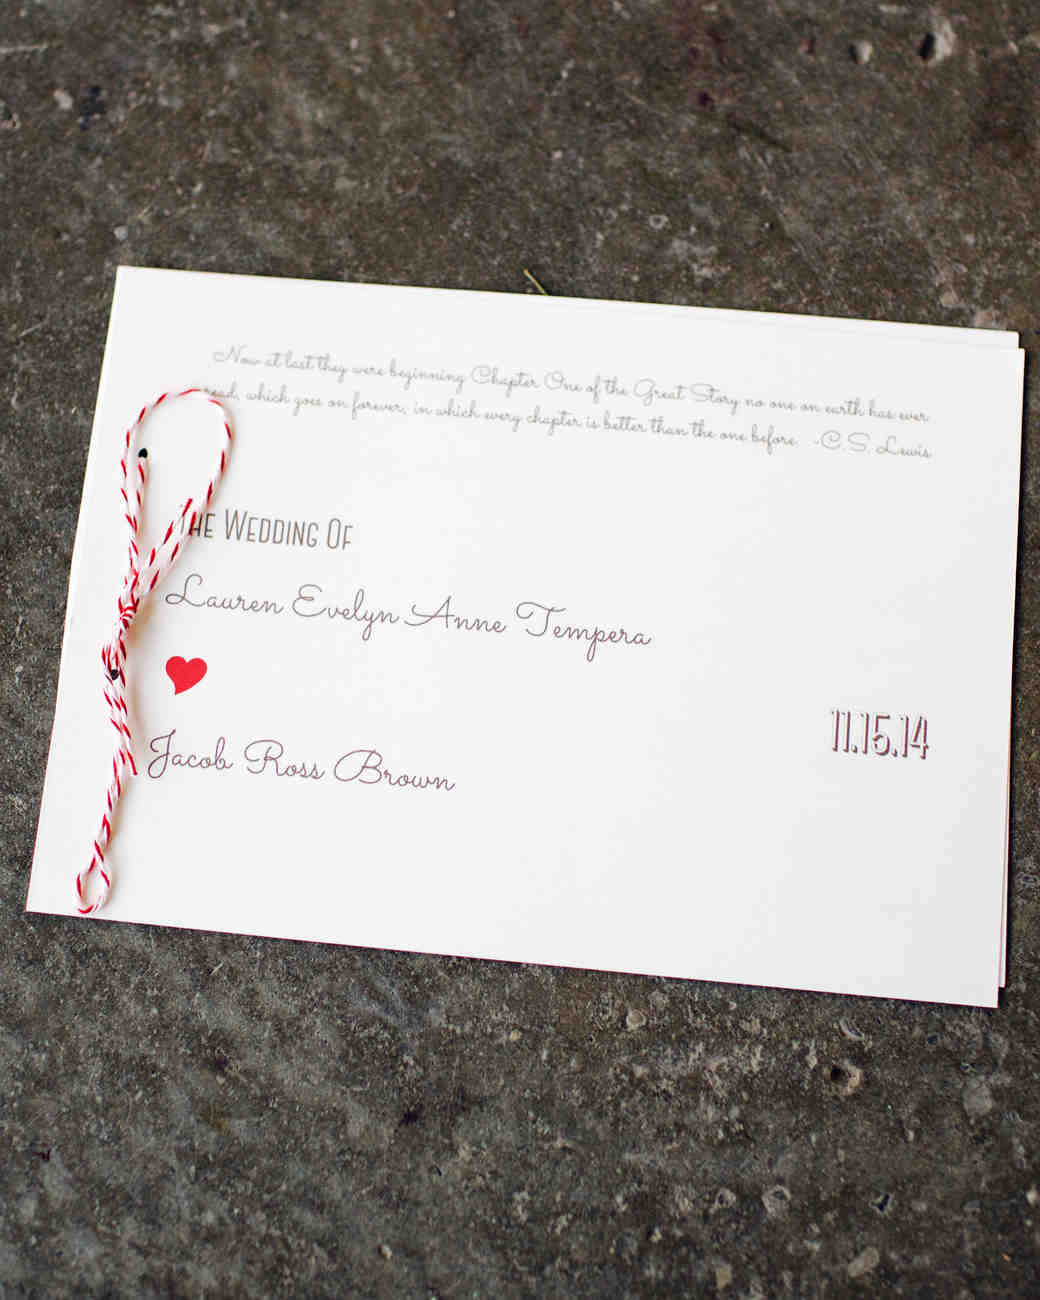 lauren-jake-wedding-program-7253-s111838-0315.jpg